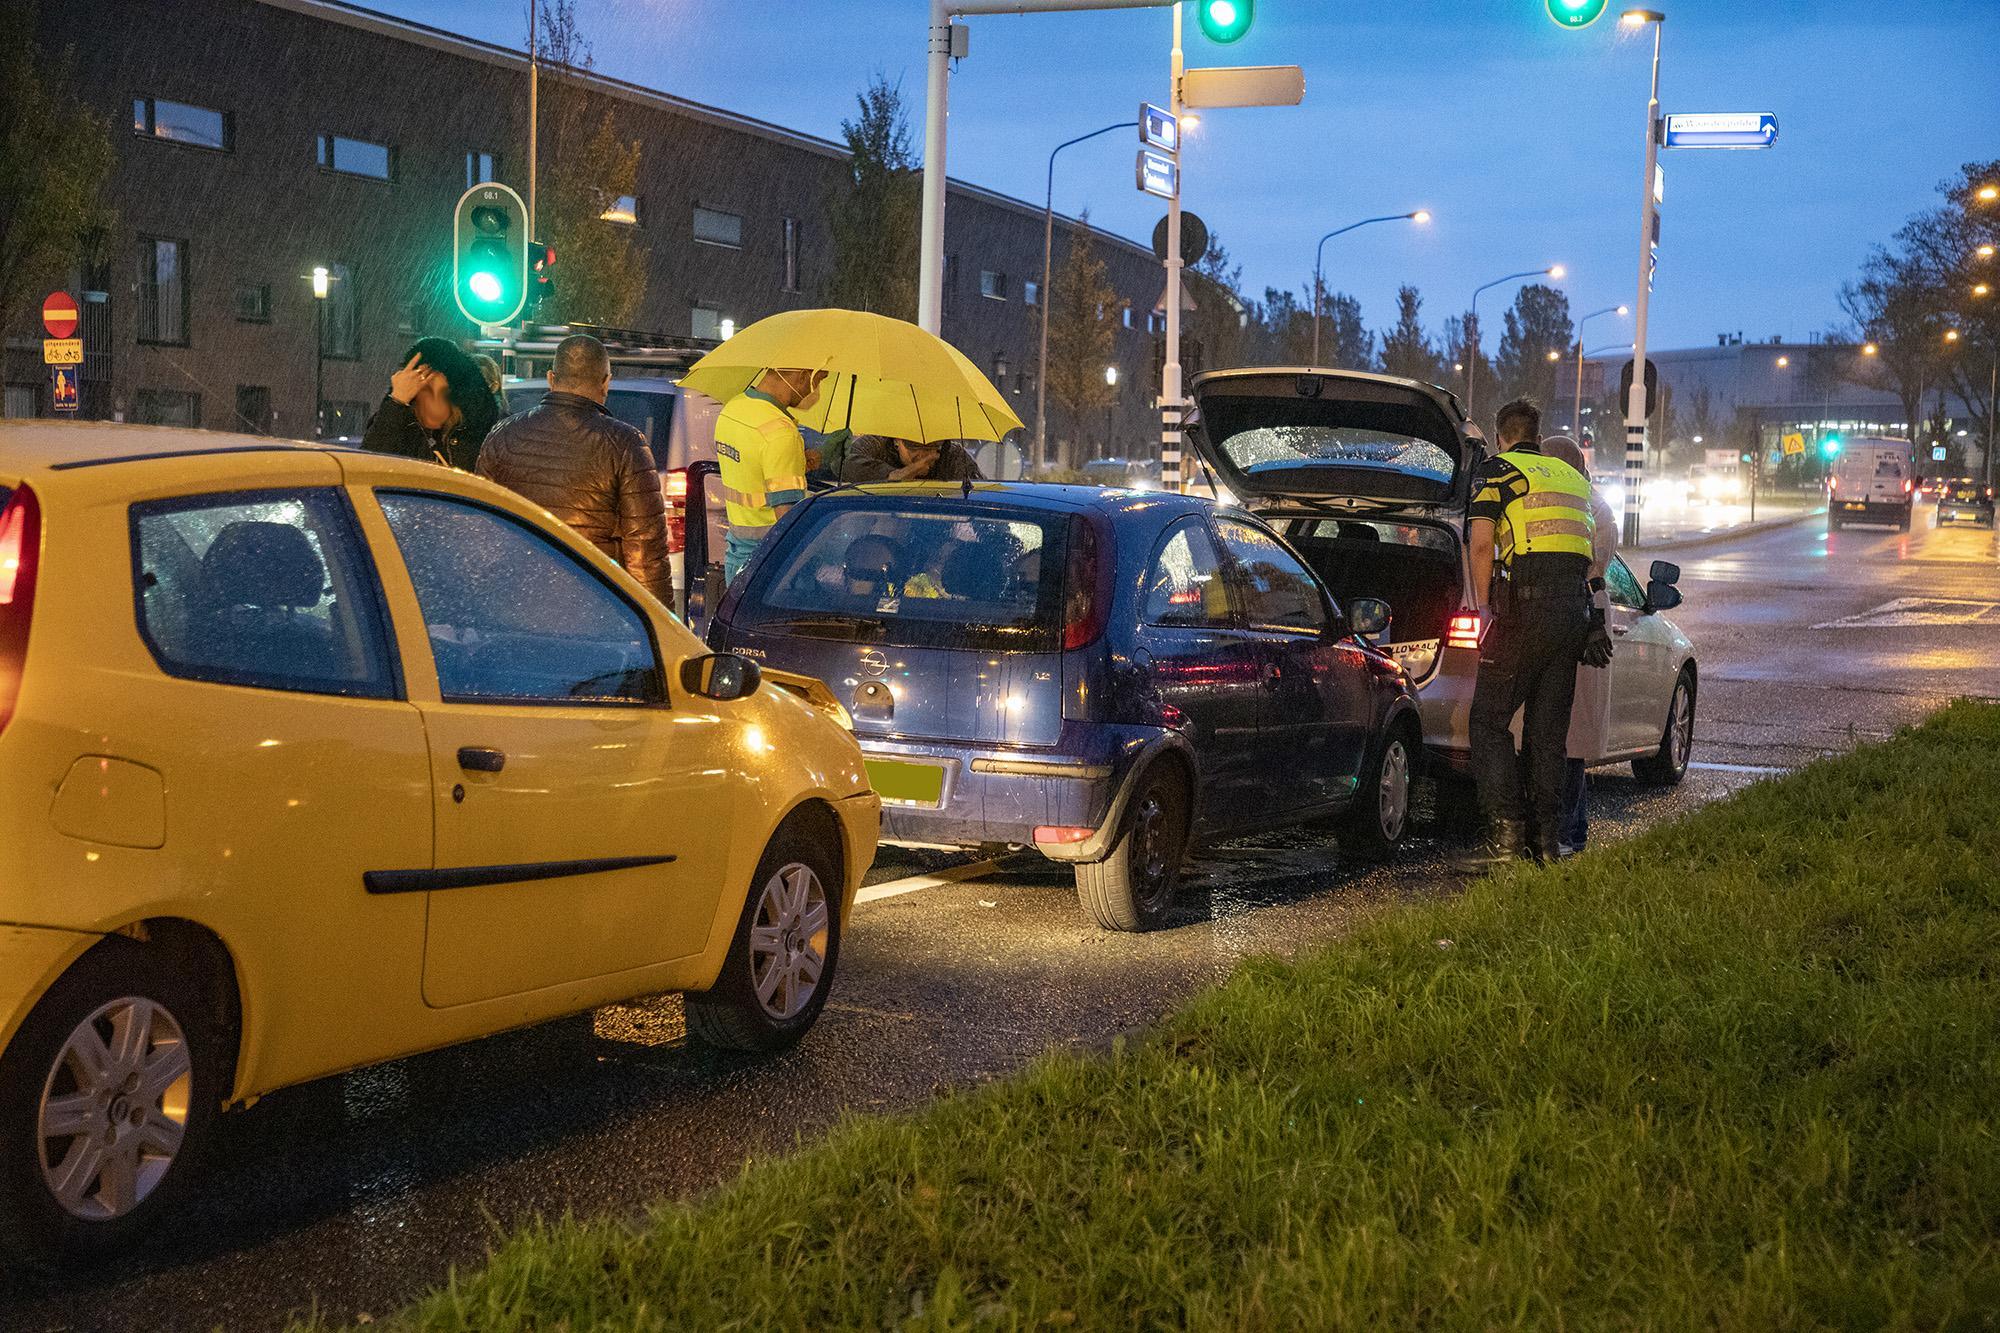 Automobiliste gewond bij kettingbotsing in Haarlem